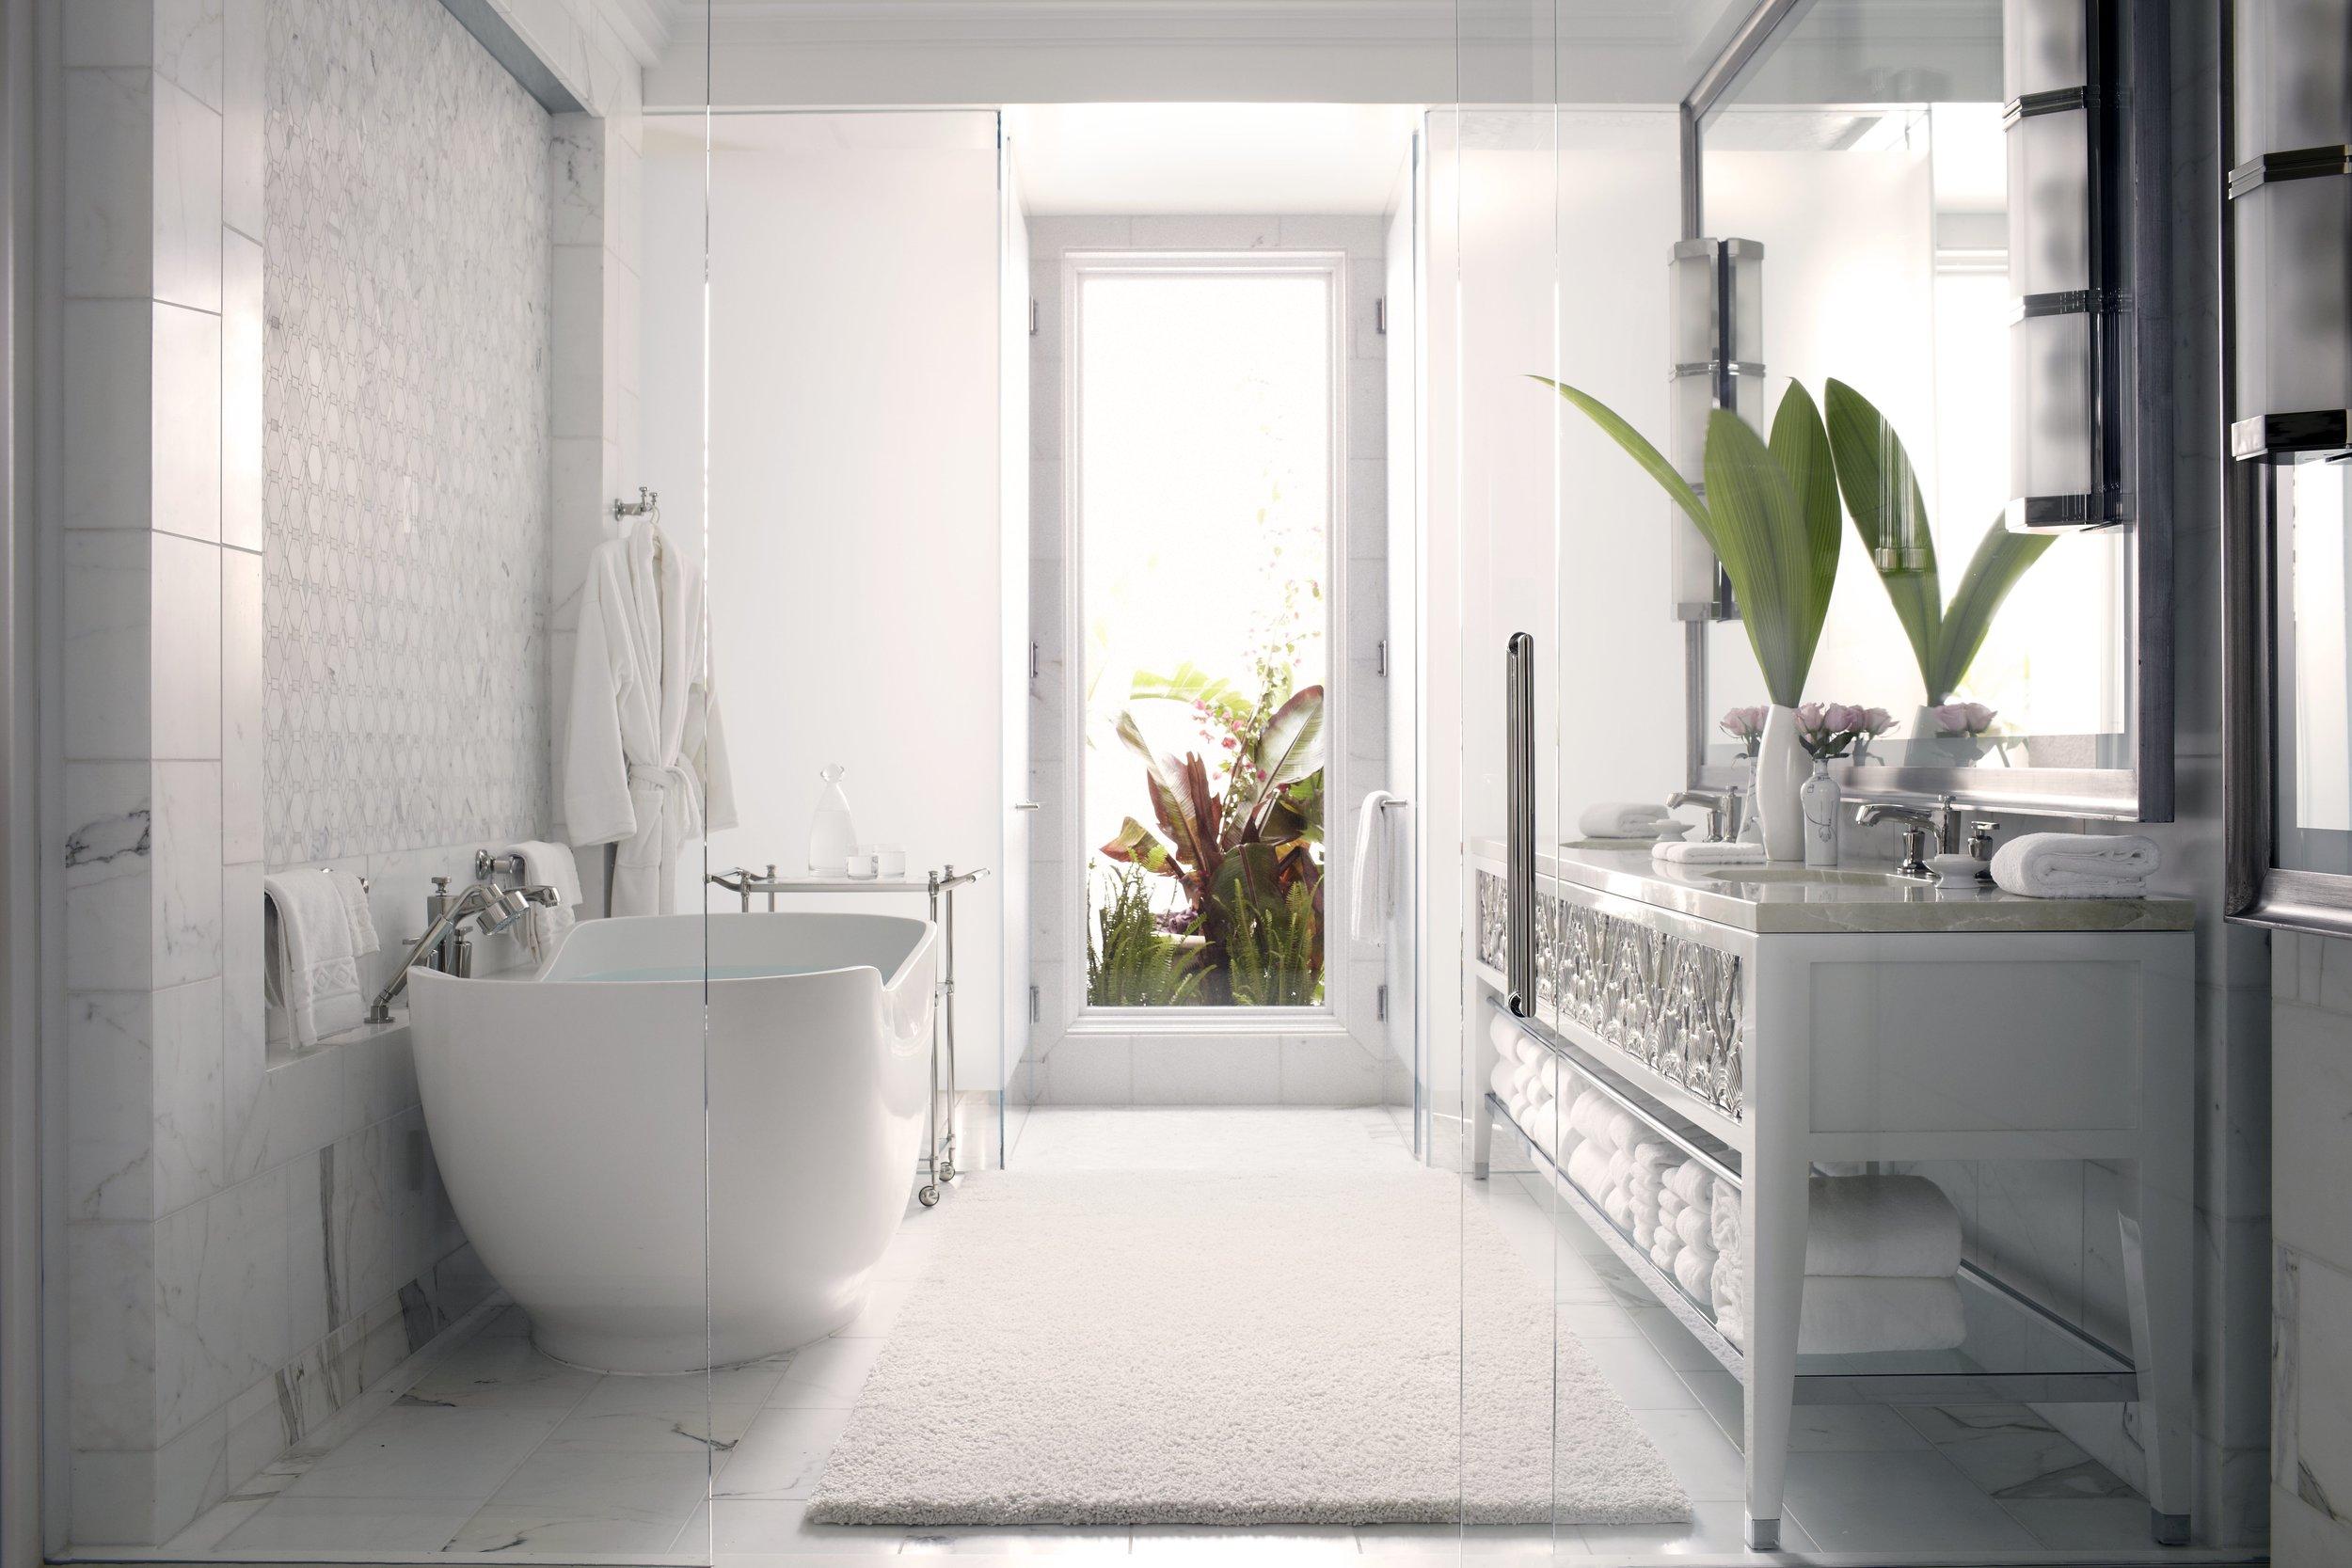 H5PE8_42933189_Master_Bathroom.jpg